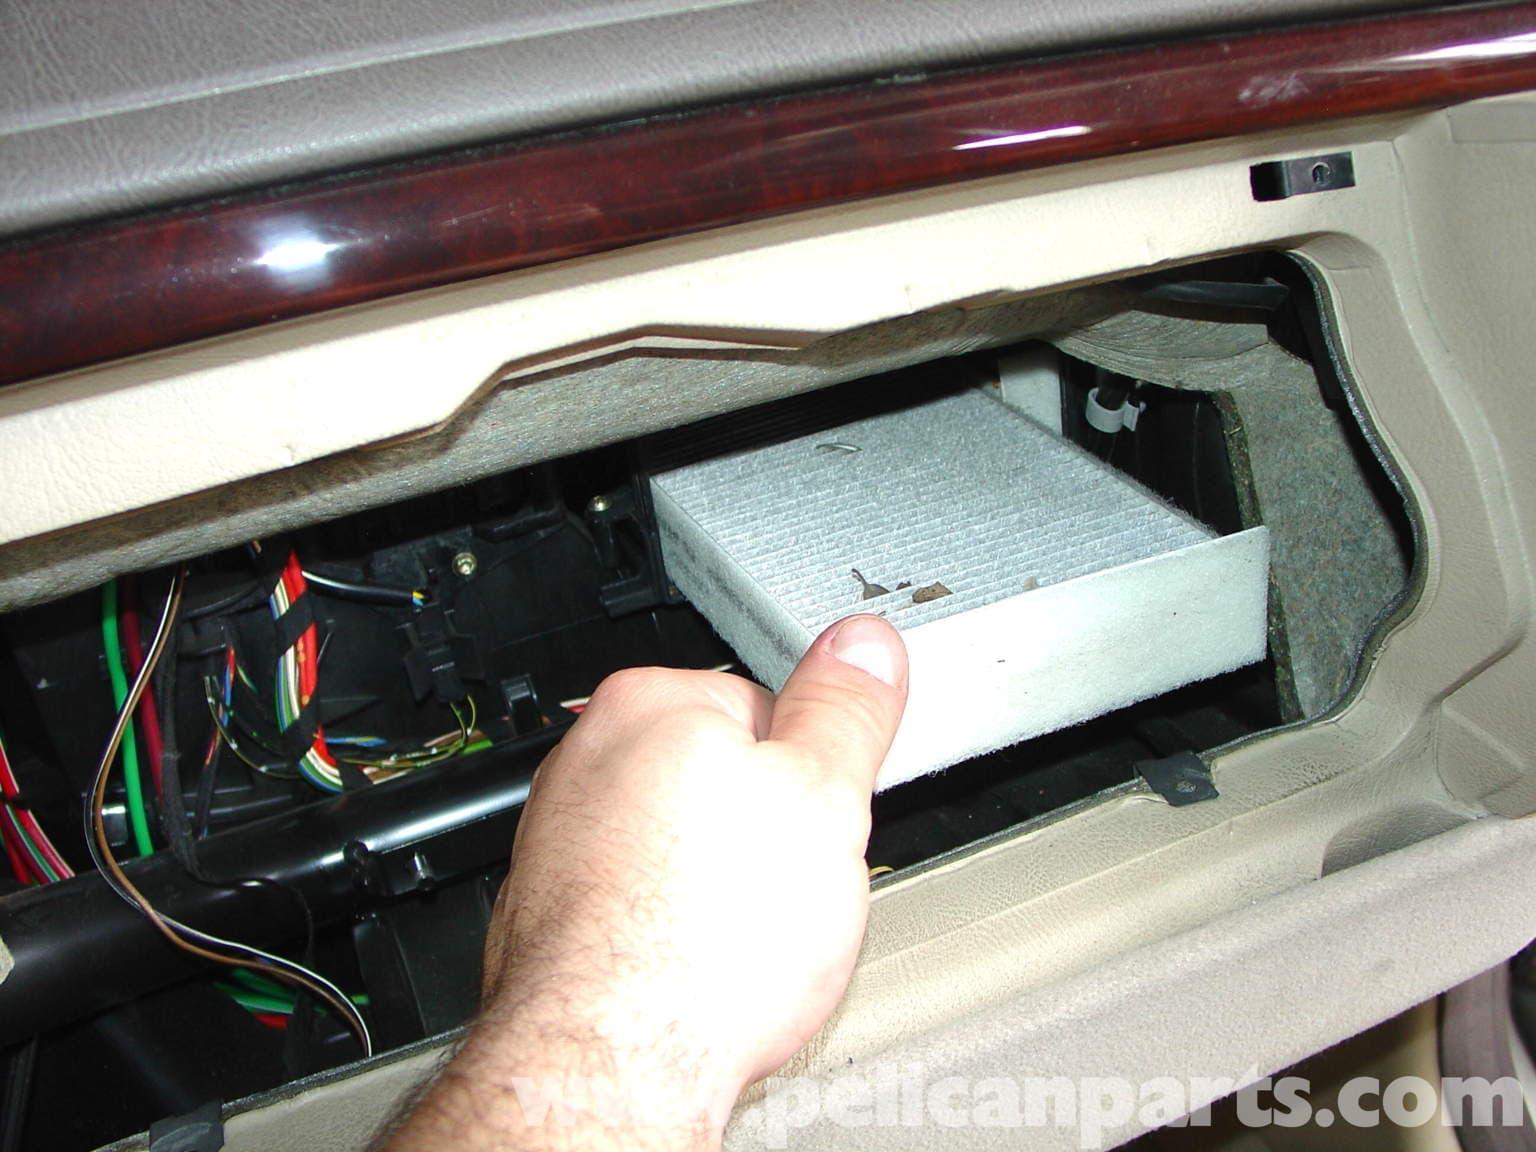 Mercedes Benz W210 Cabin Air Filter Replacement 1996 03